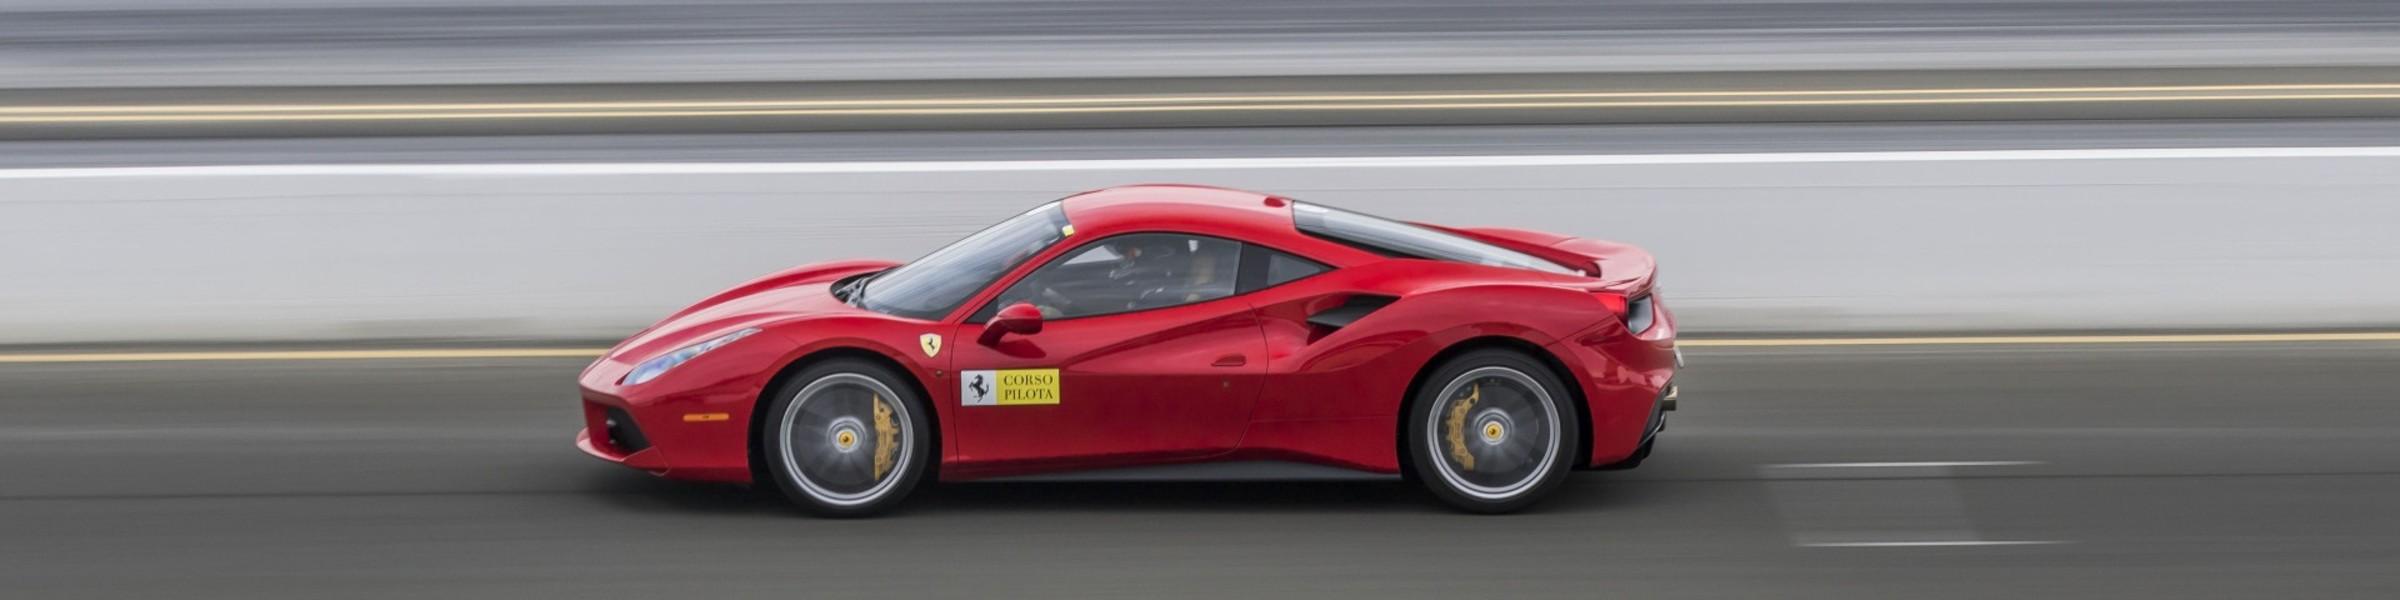 Ferrari North America Events Ferrari Corso Pilota Driving School